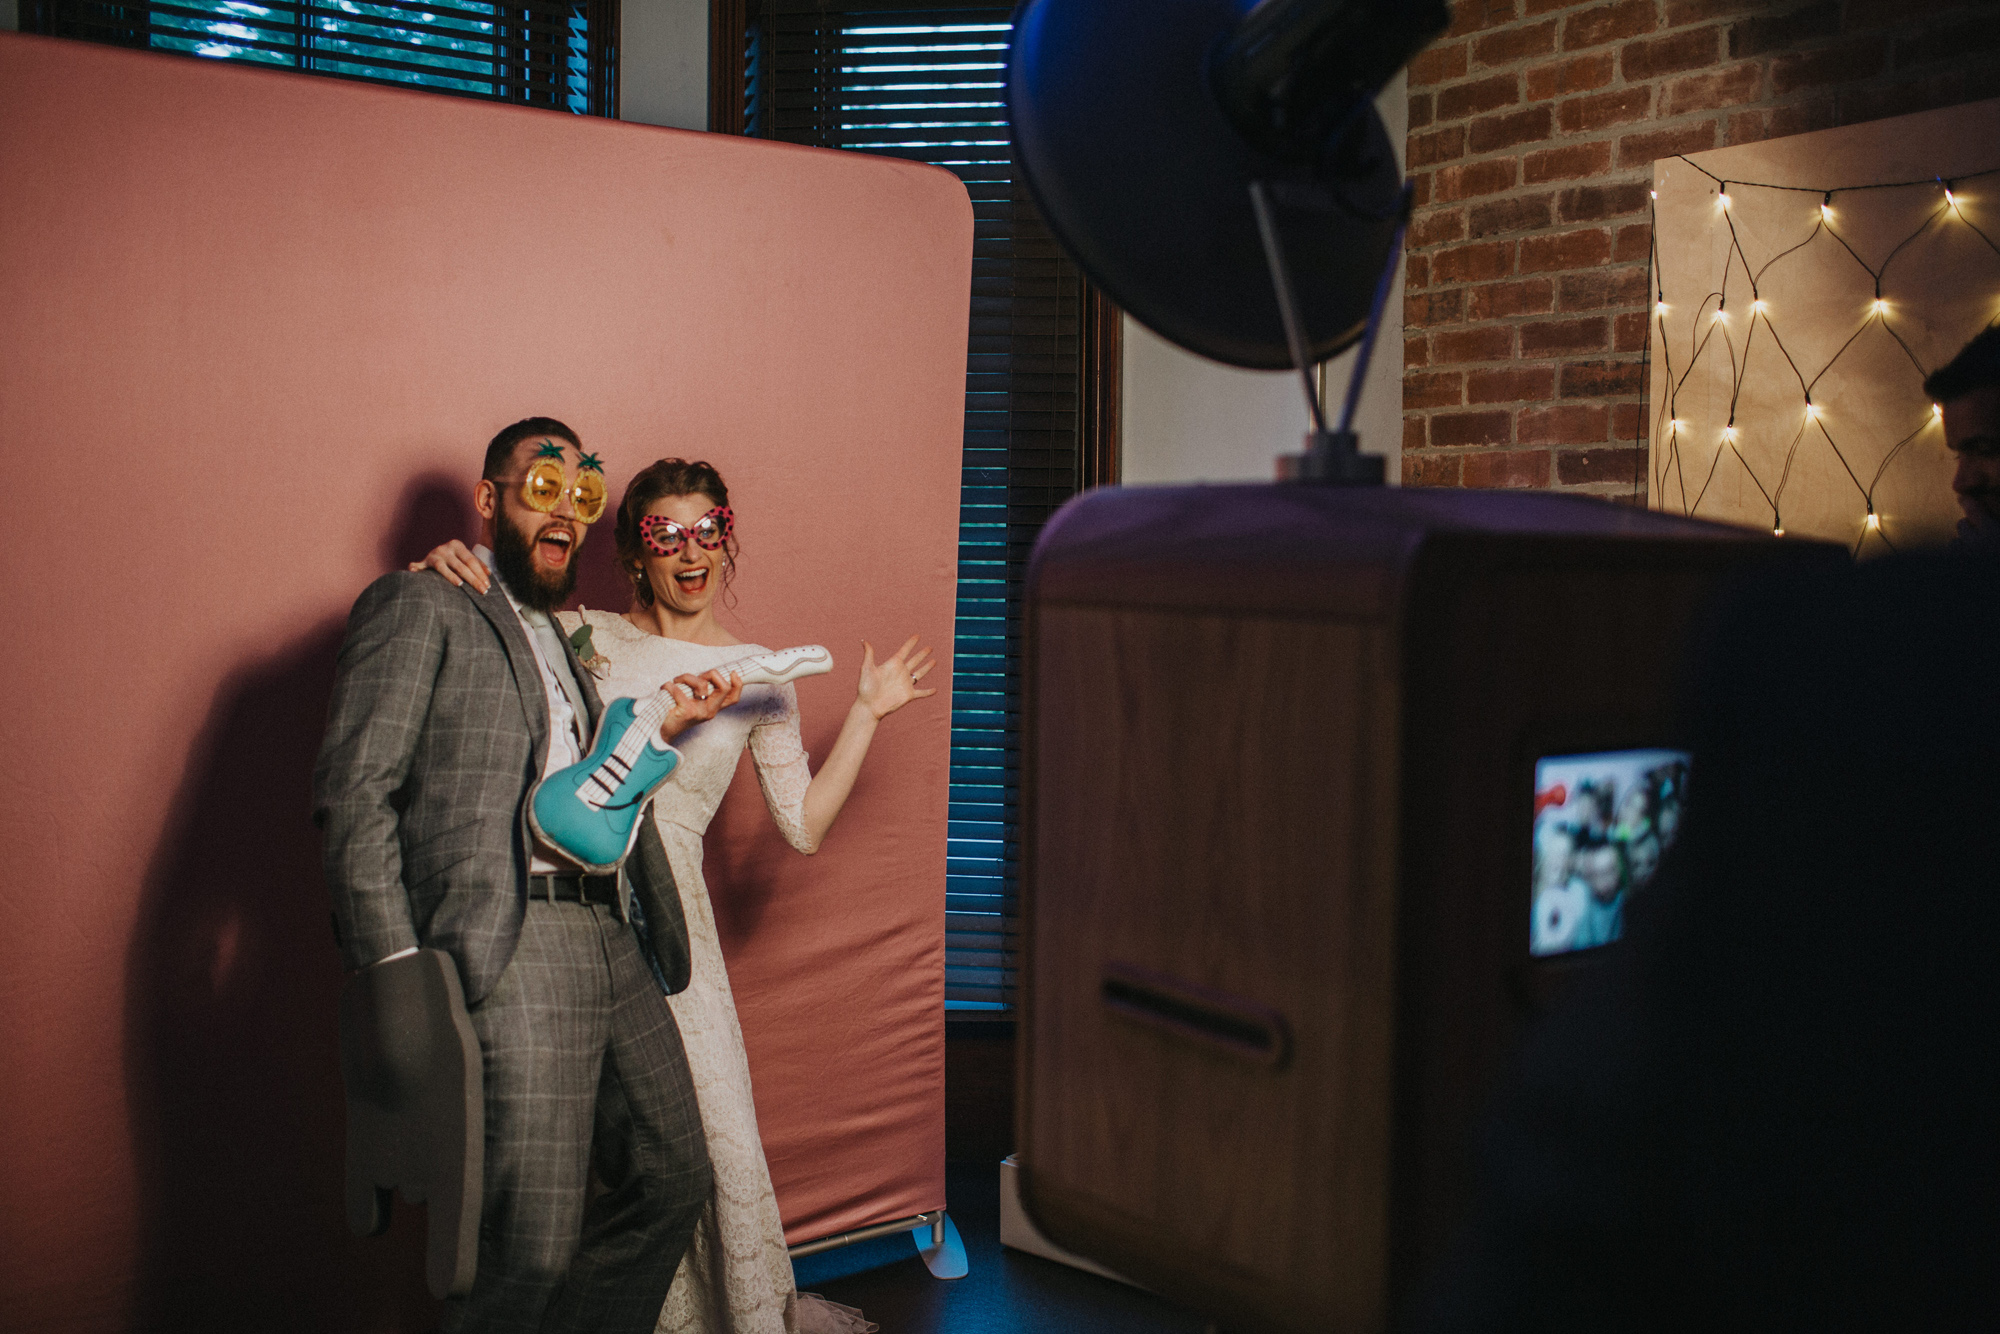 Kate-Beaumont-Lace-Flared-Dahlia-Gown-Leeds-Wedding-Bloom-Weddings-59.jpg